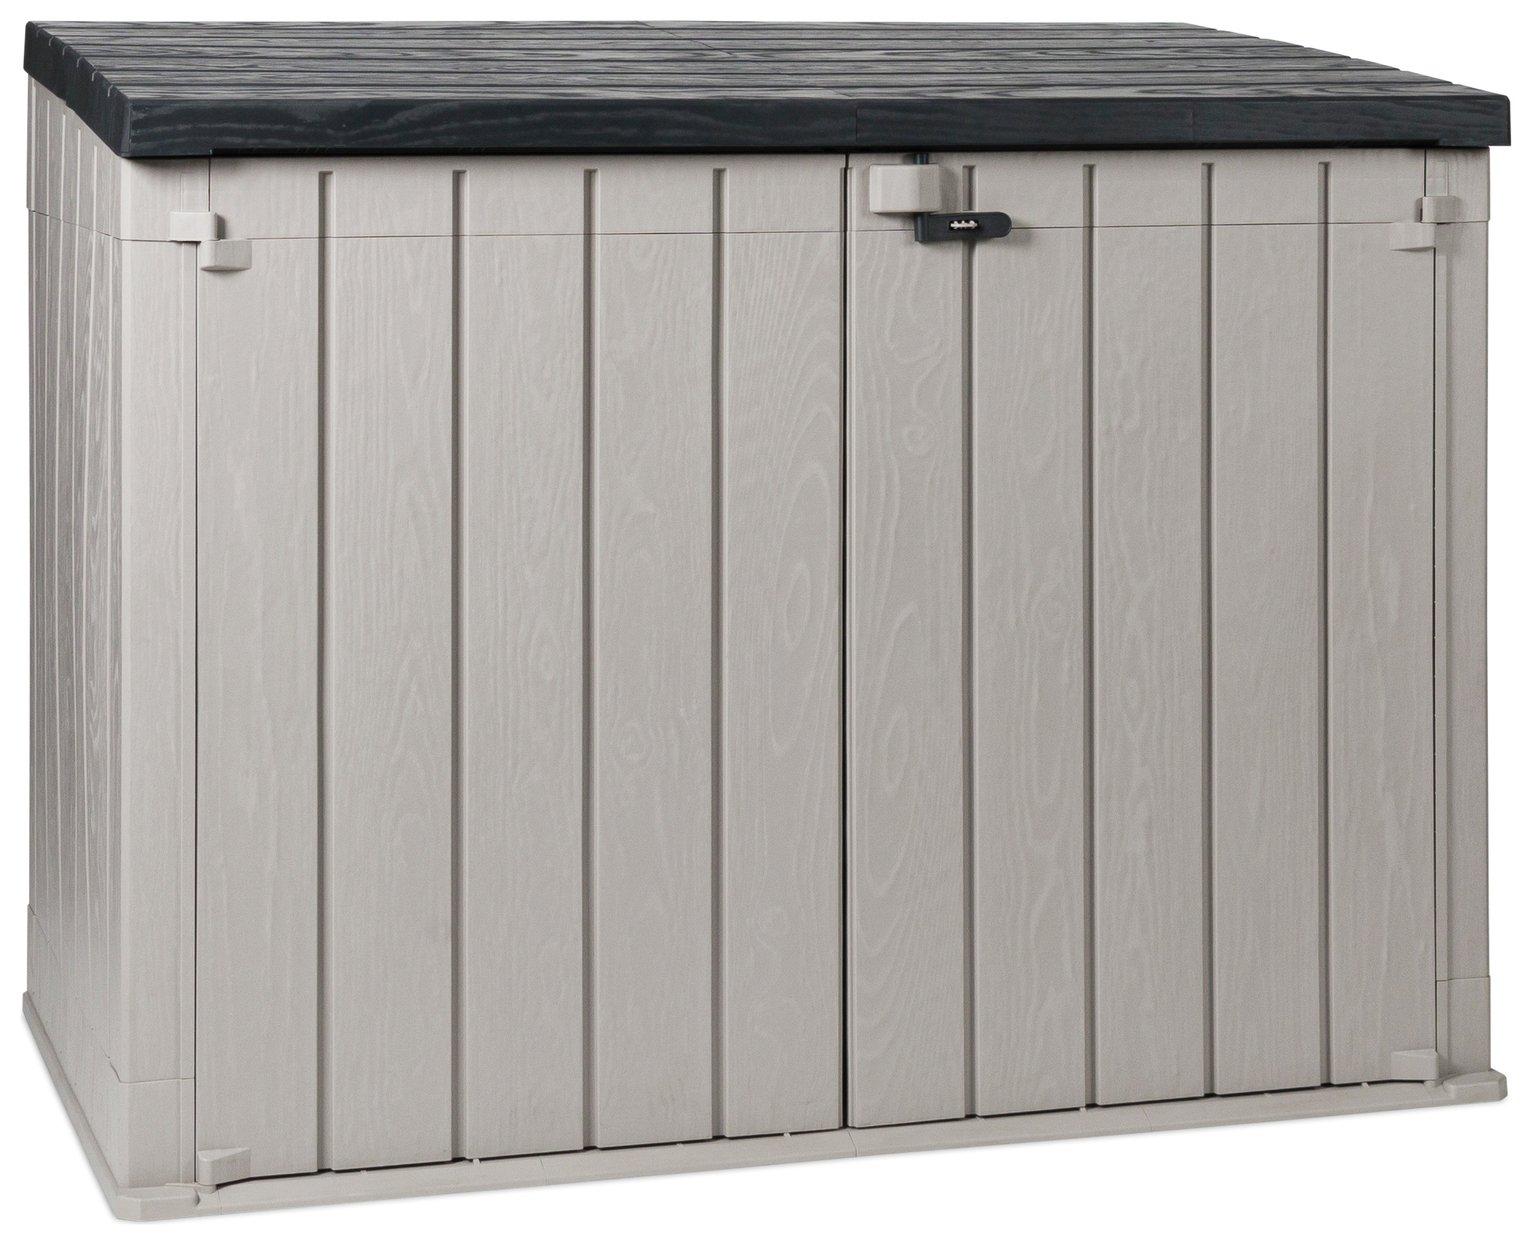 Toomax Storaway 2270L Wood Effect Garden Storage Box - Grey